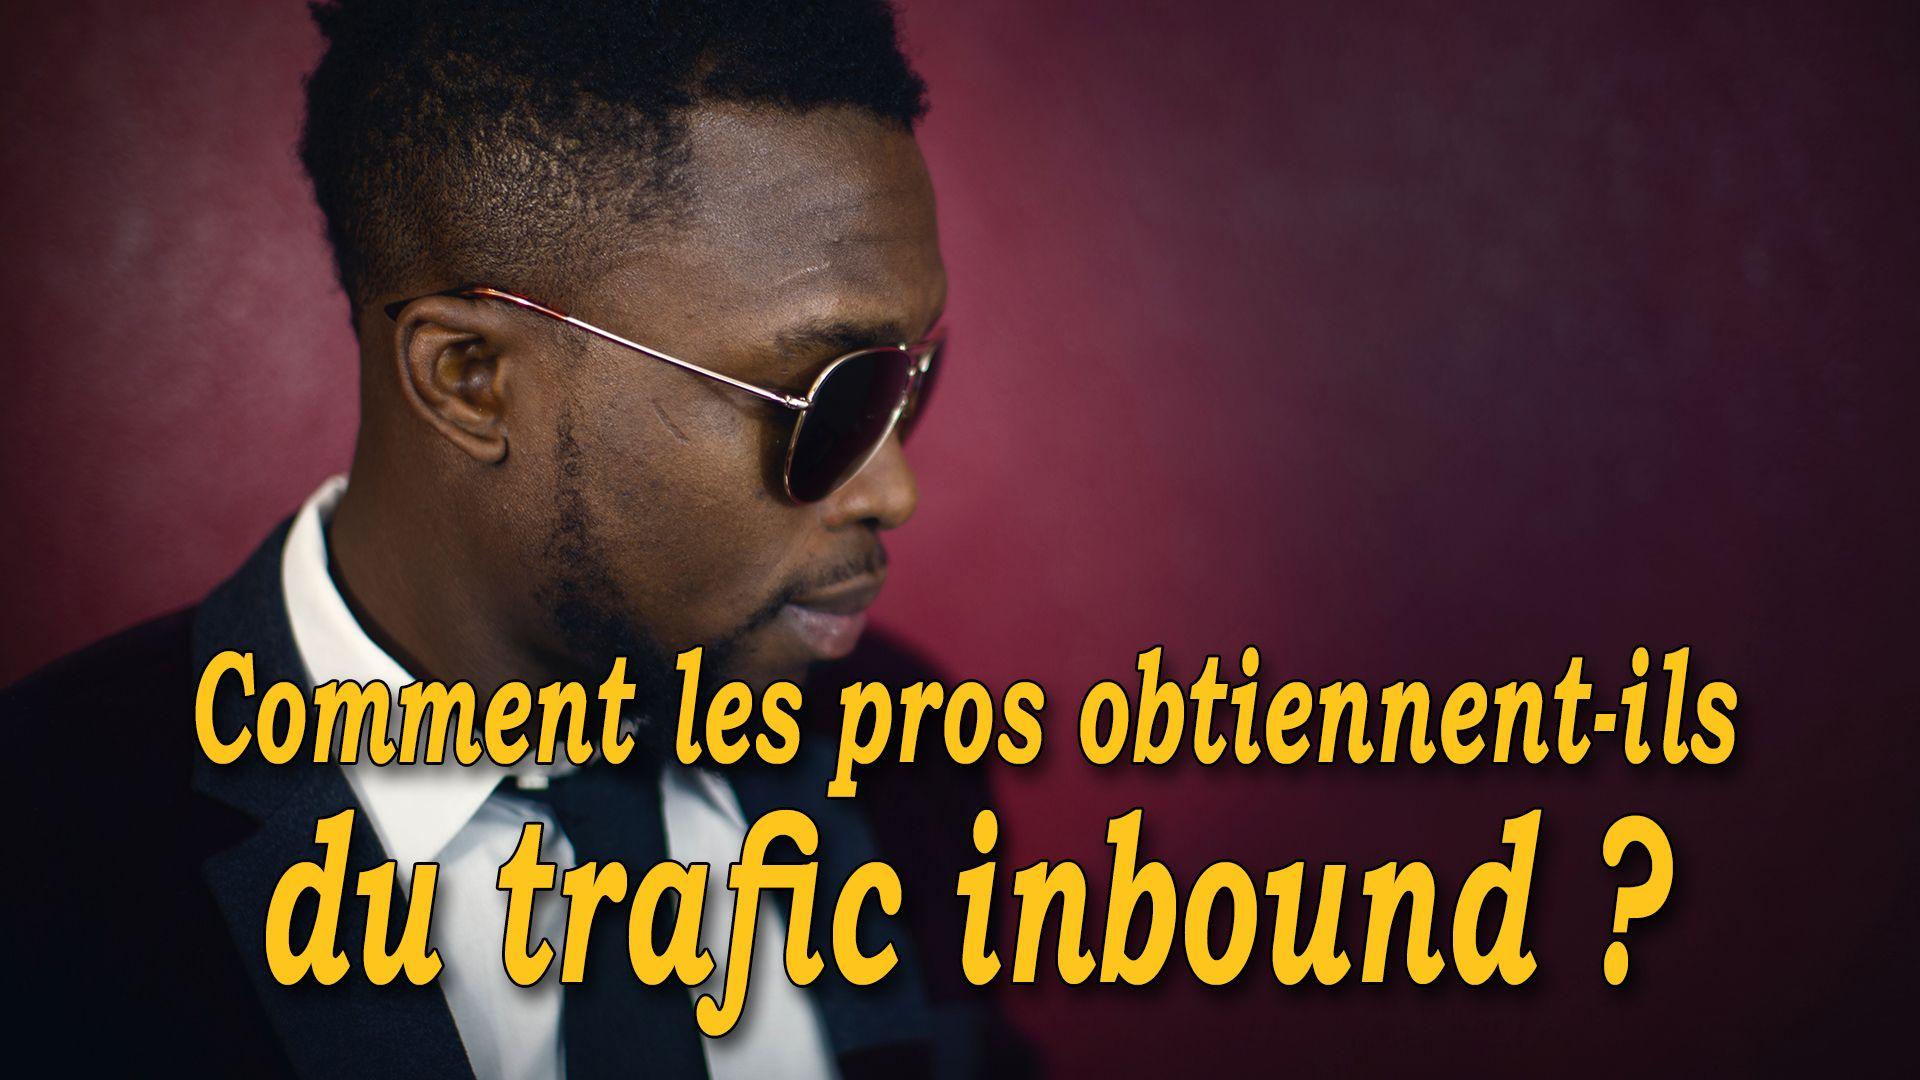 Comment les pros obtiennent-ils du trafic inbound ? #GrowthHacking #WebMarketing #FormationGrowthHacking #CentreDeFormationFrance #TunnelAARRR #AARRR #SocialMedia #CommunityManagement #SEO #inbound #inboundmarketing